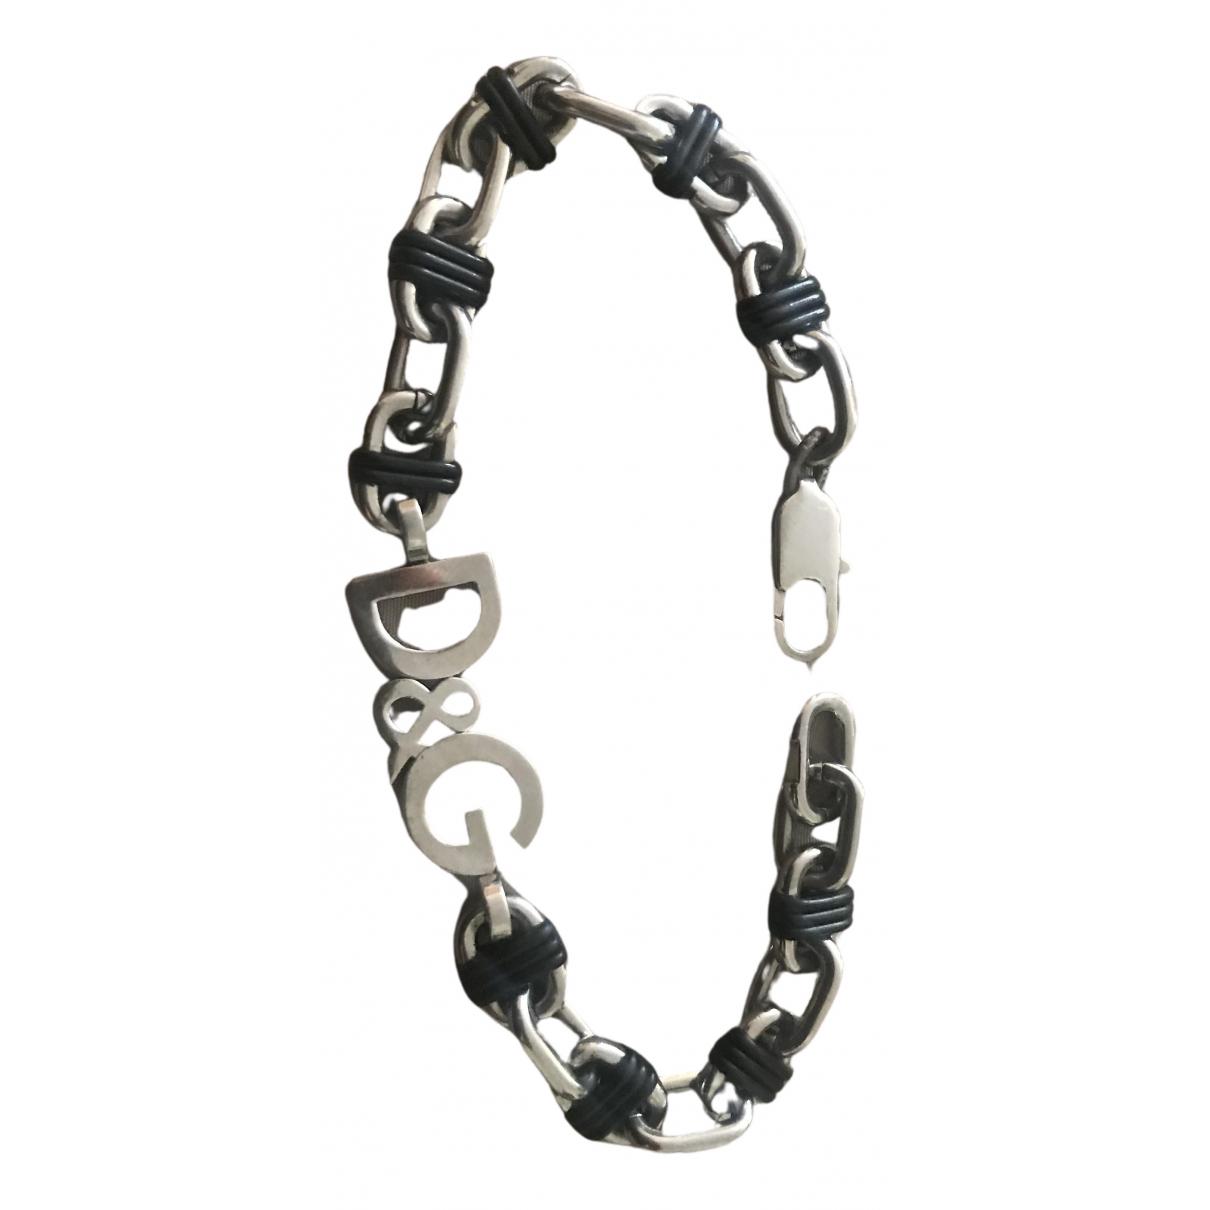 D&g \N Armband in  Schwarz Silber